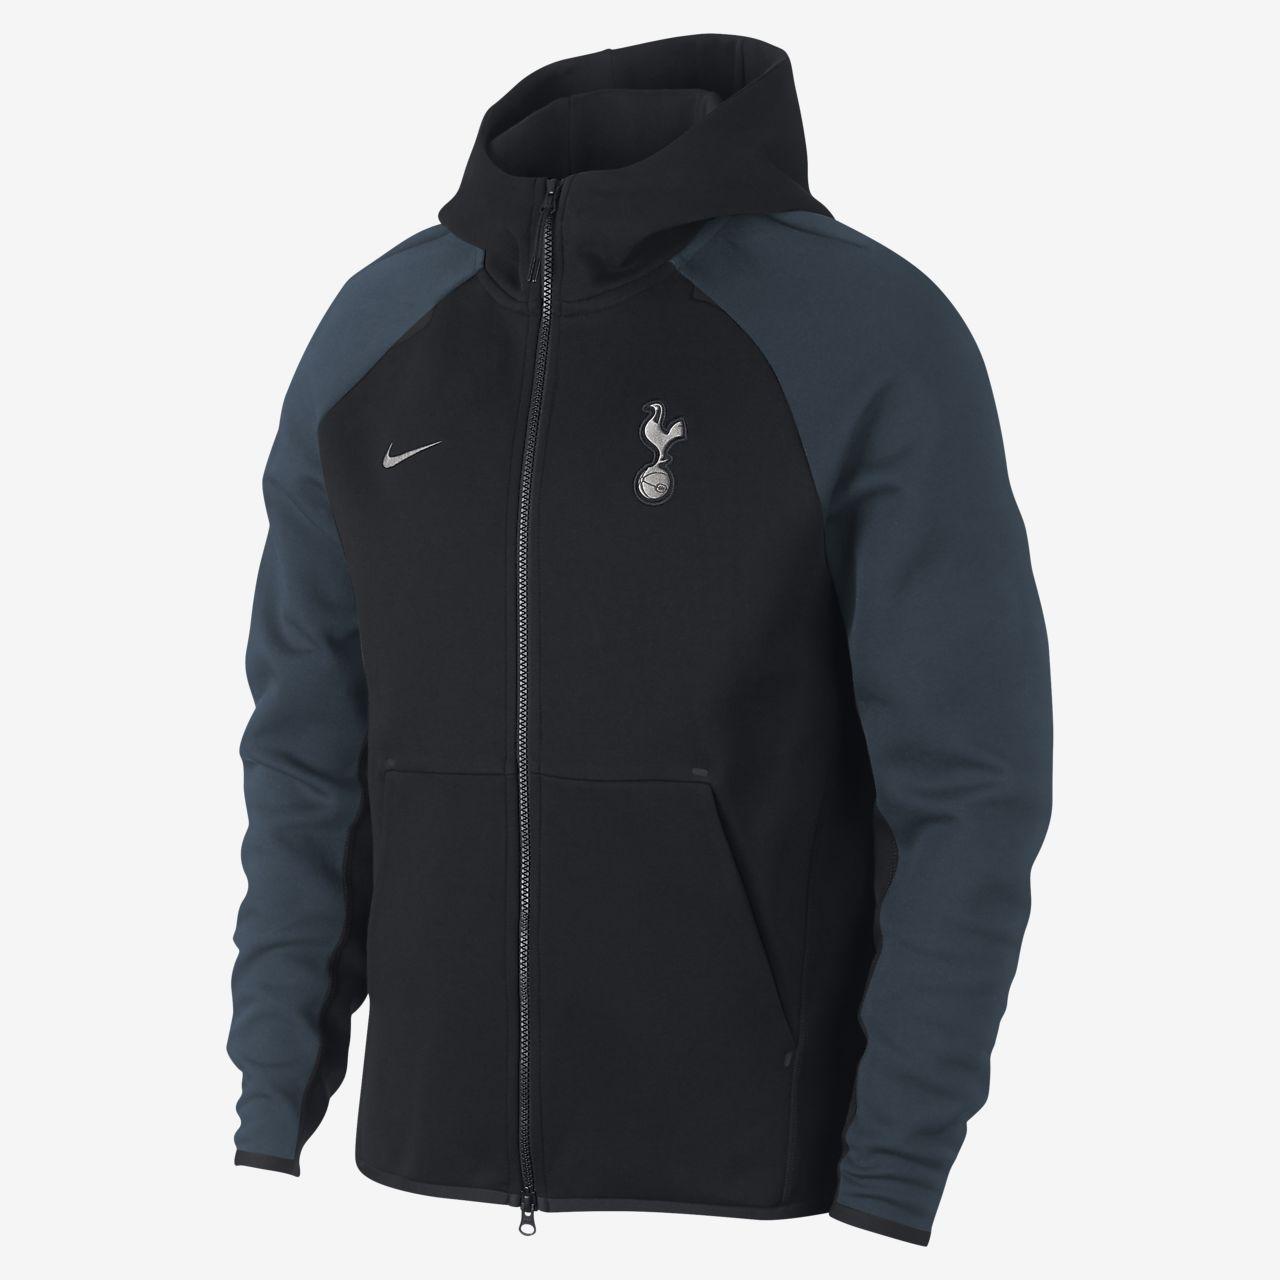 Tottenham Hotspur Tech Fleece Herren-Hoodie mit durchgehendem Reißverschluss